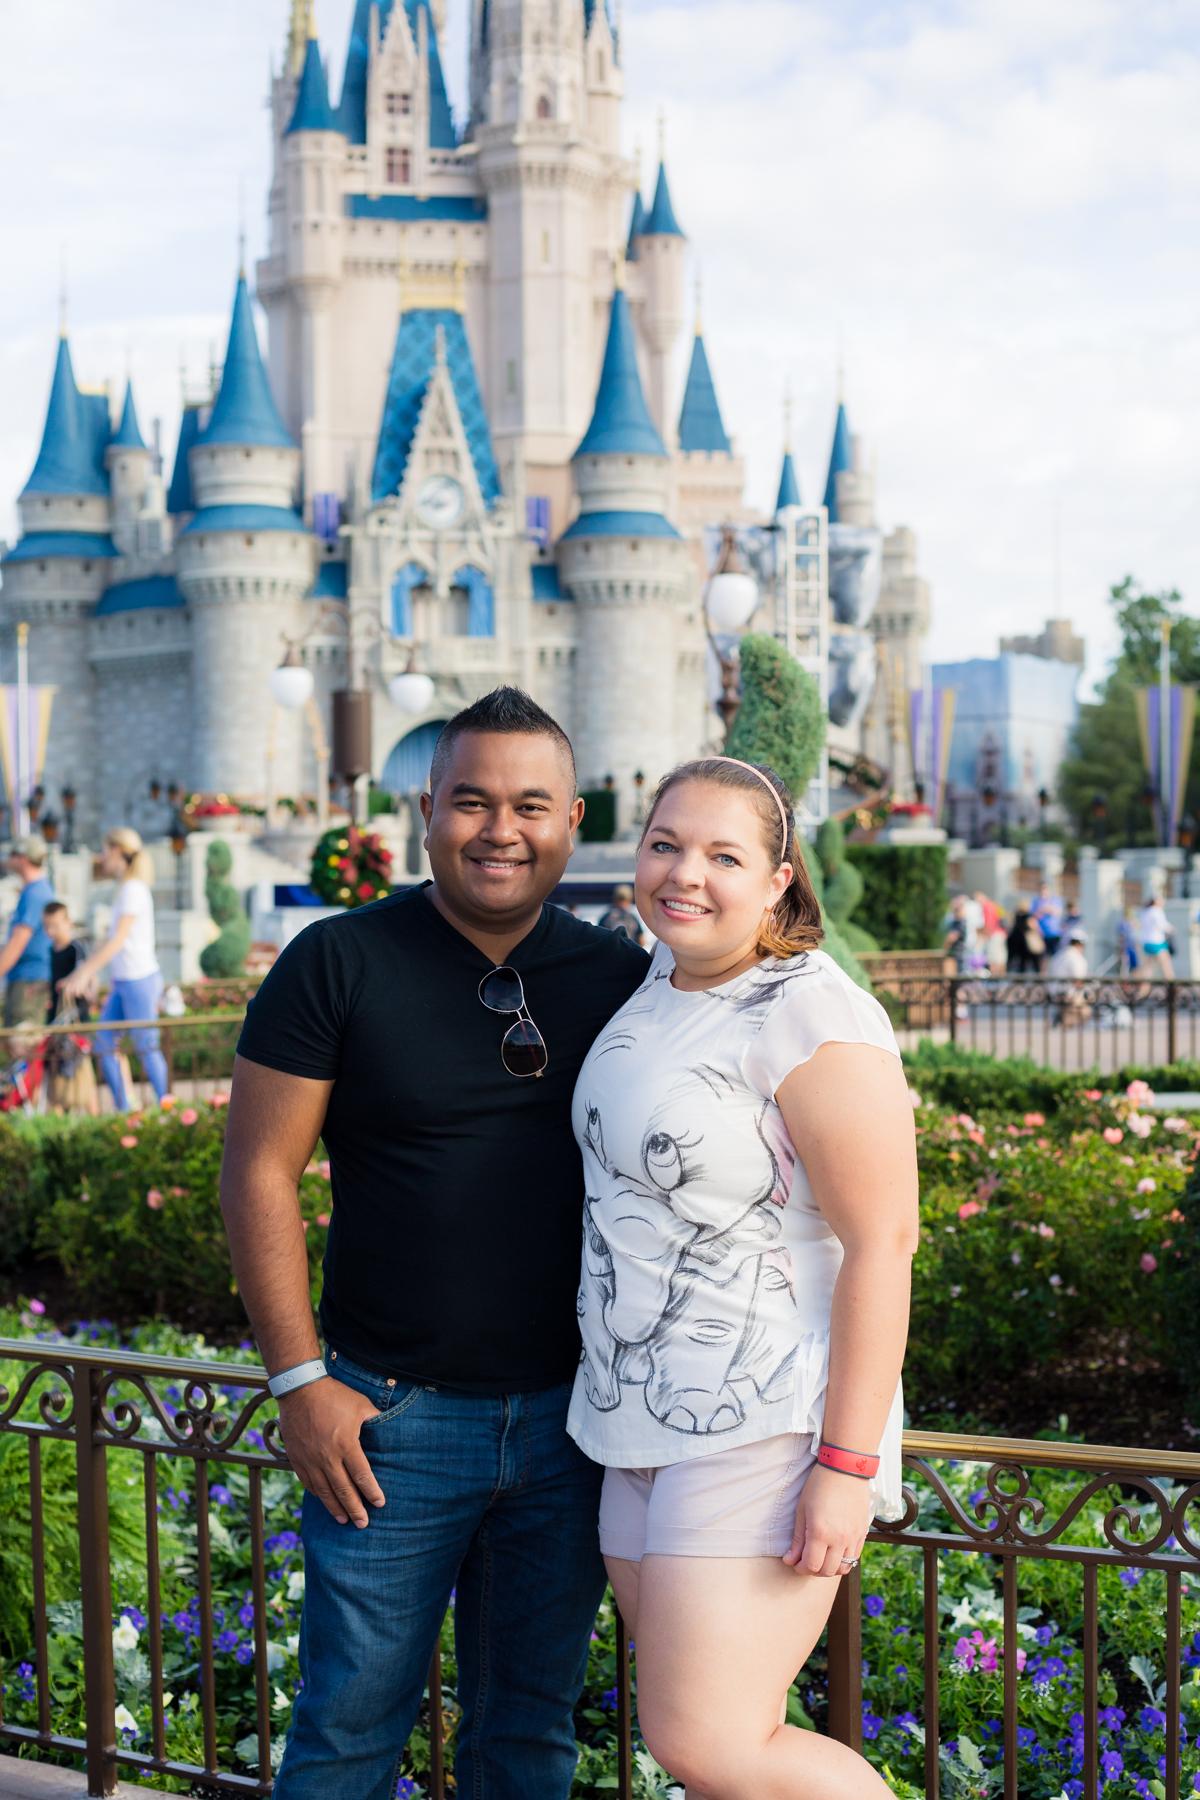 Disney World Pregnancy Announcement Photo - Our Long Life Blog